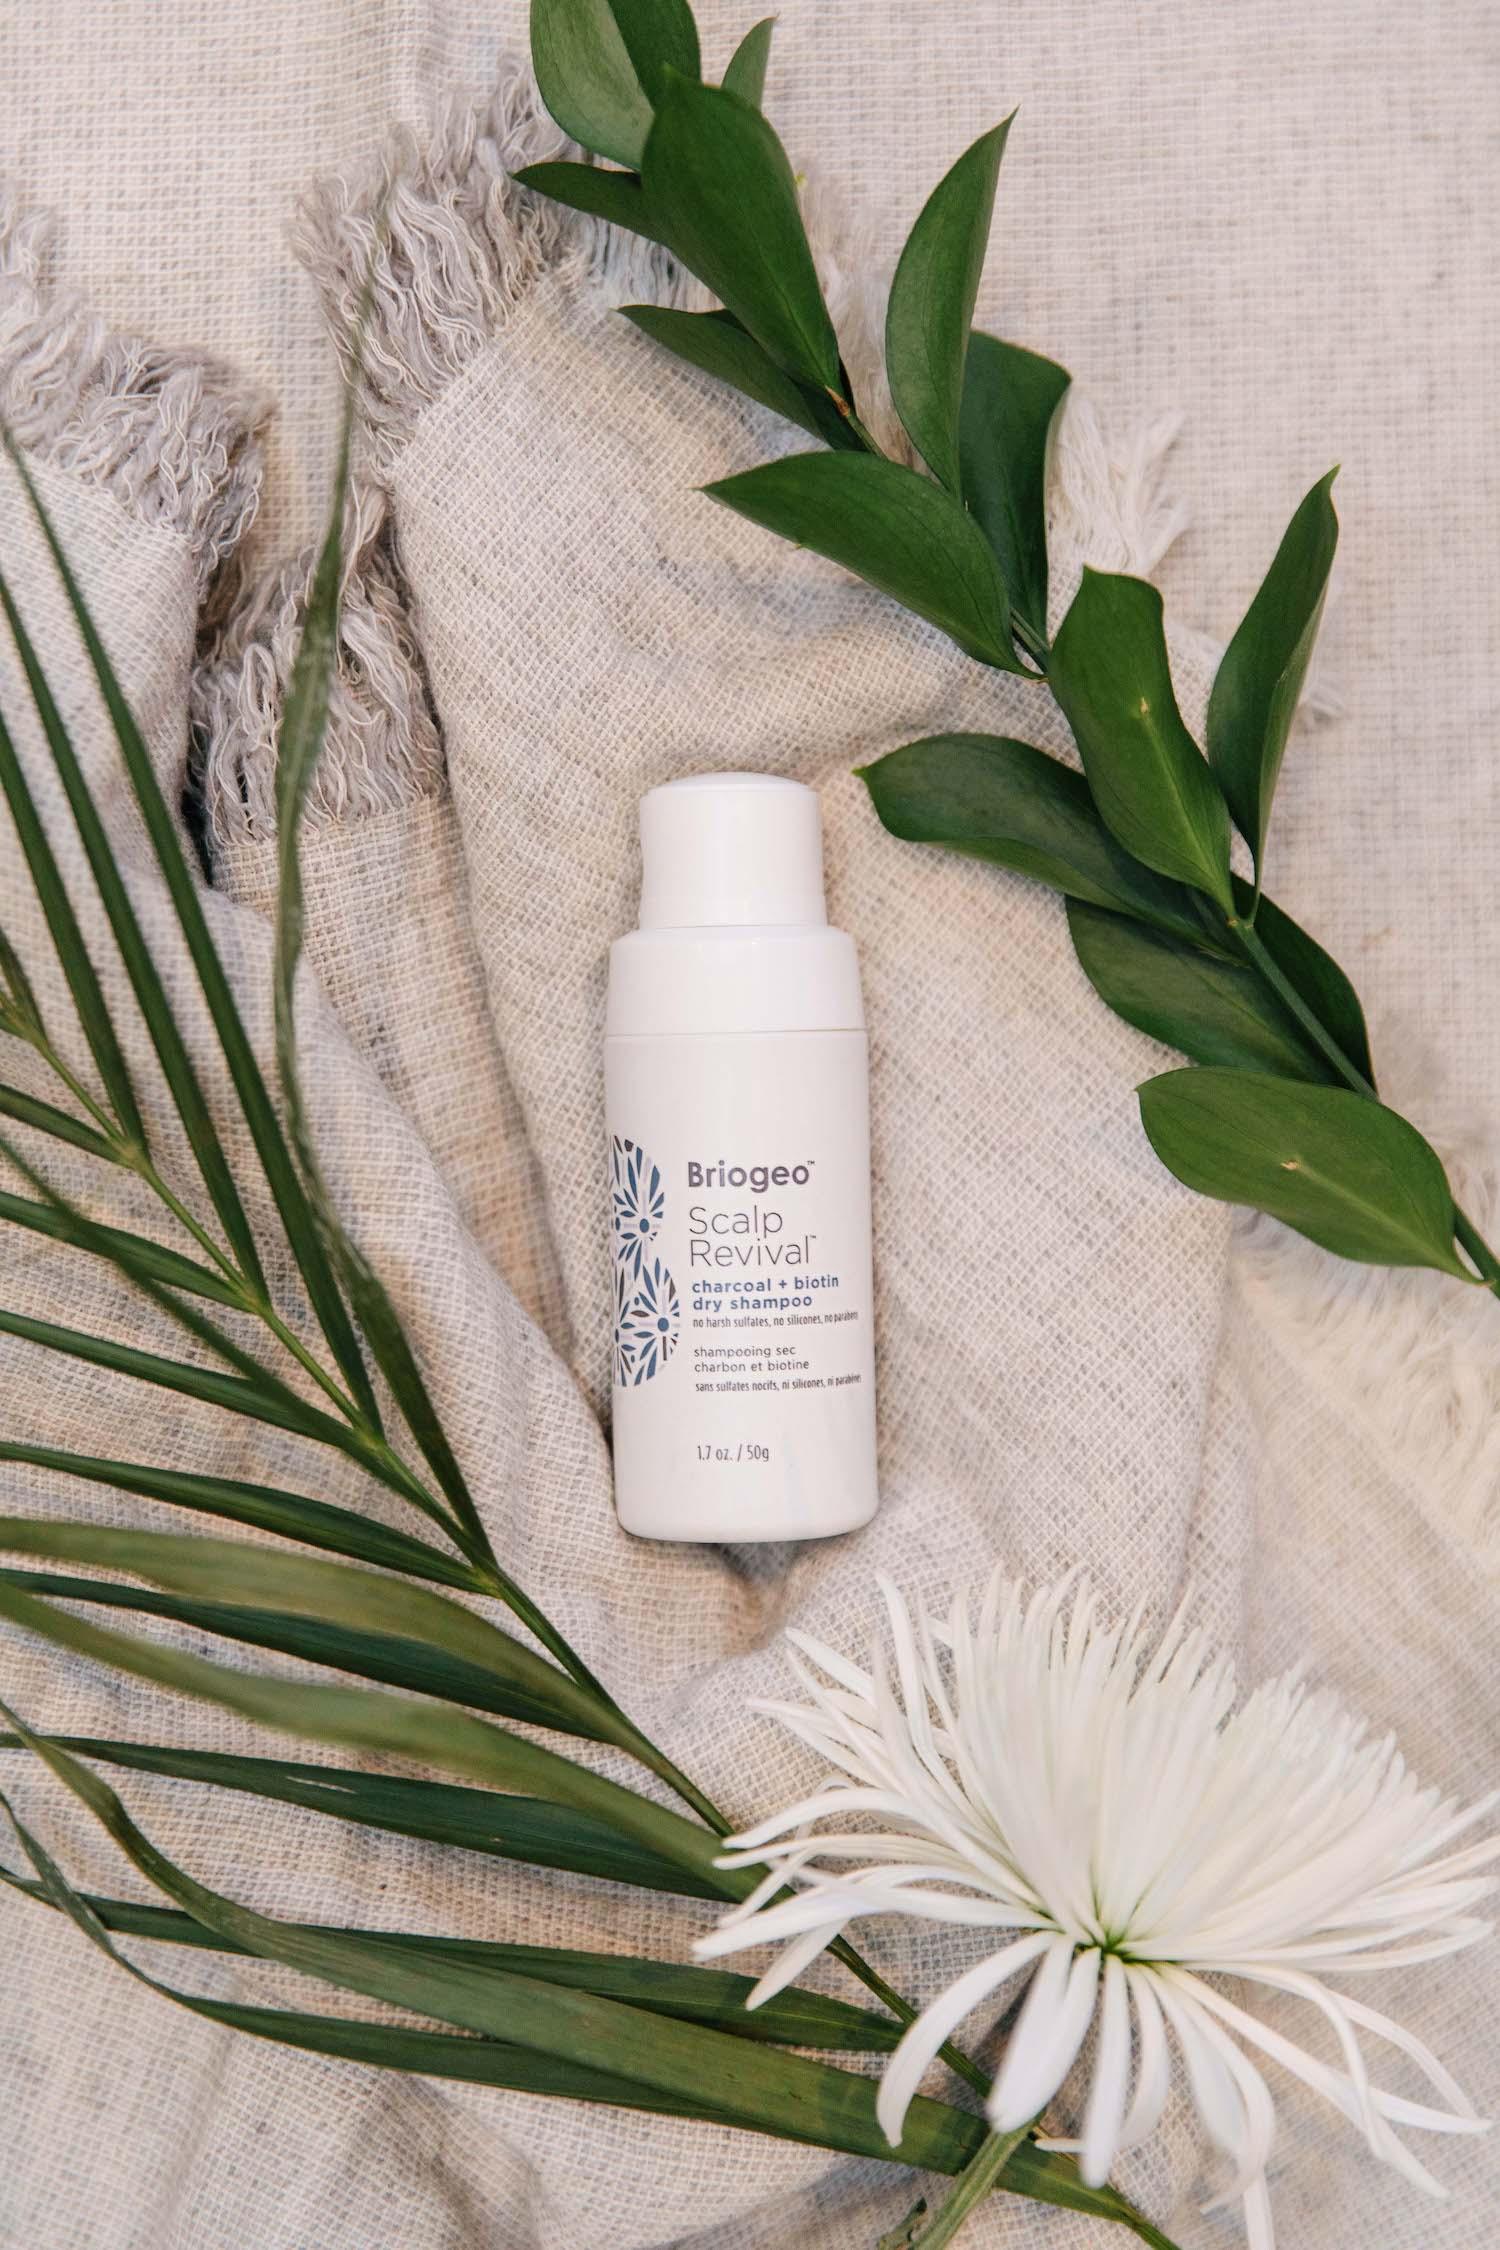 briogeo biotin + charcoal dry shampoo